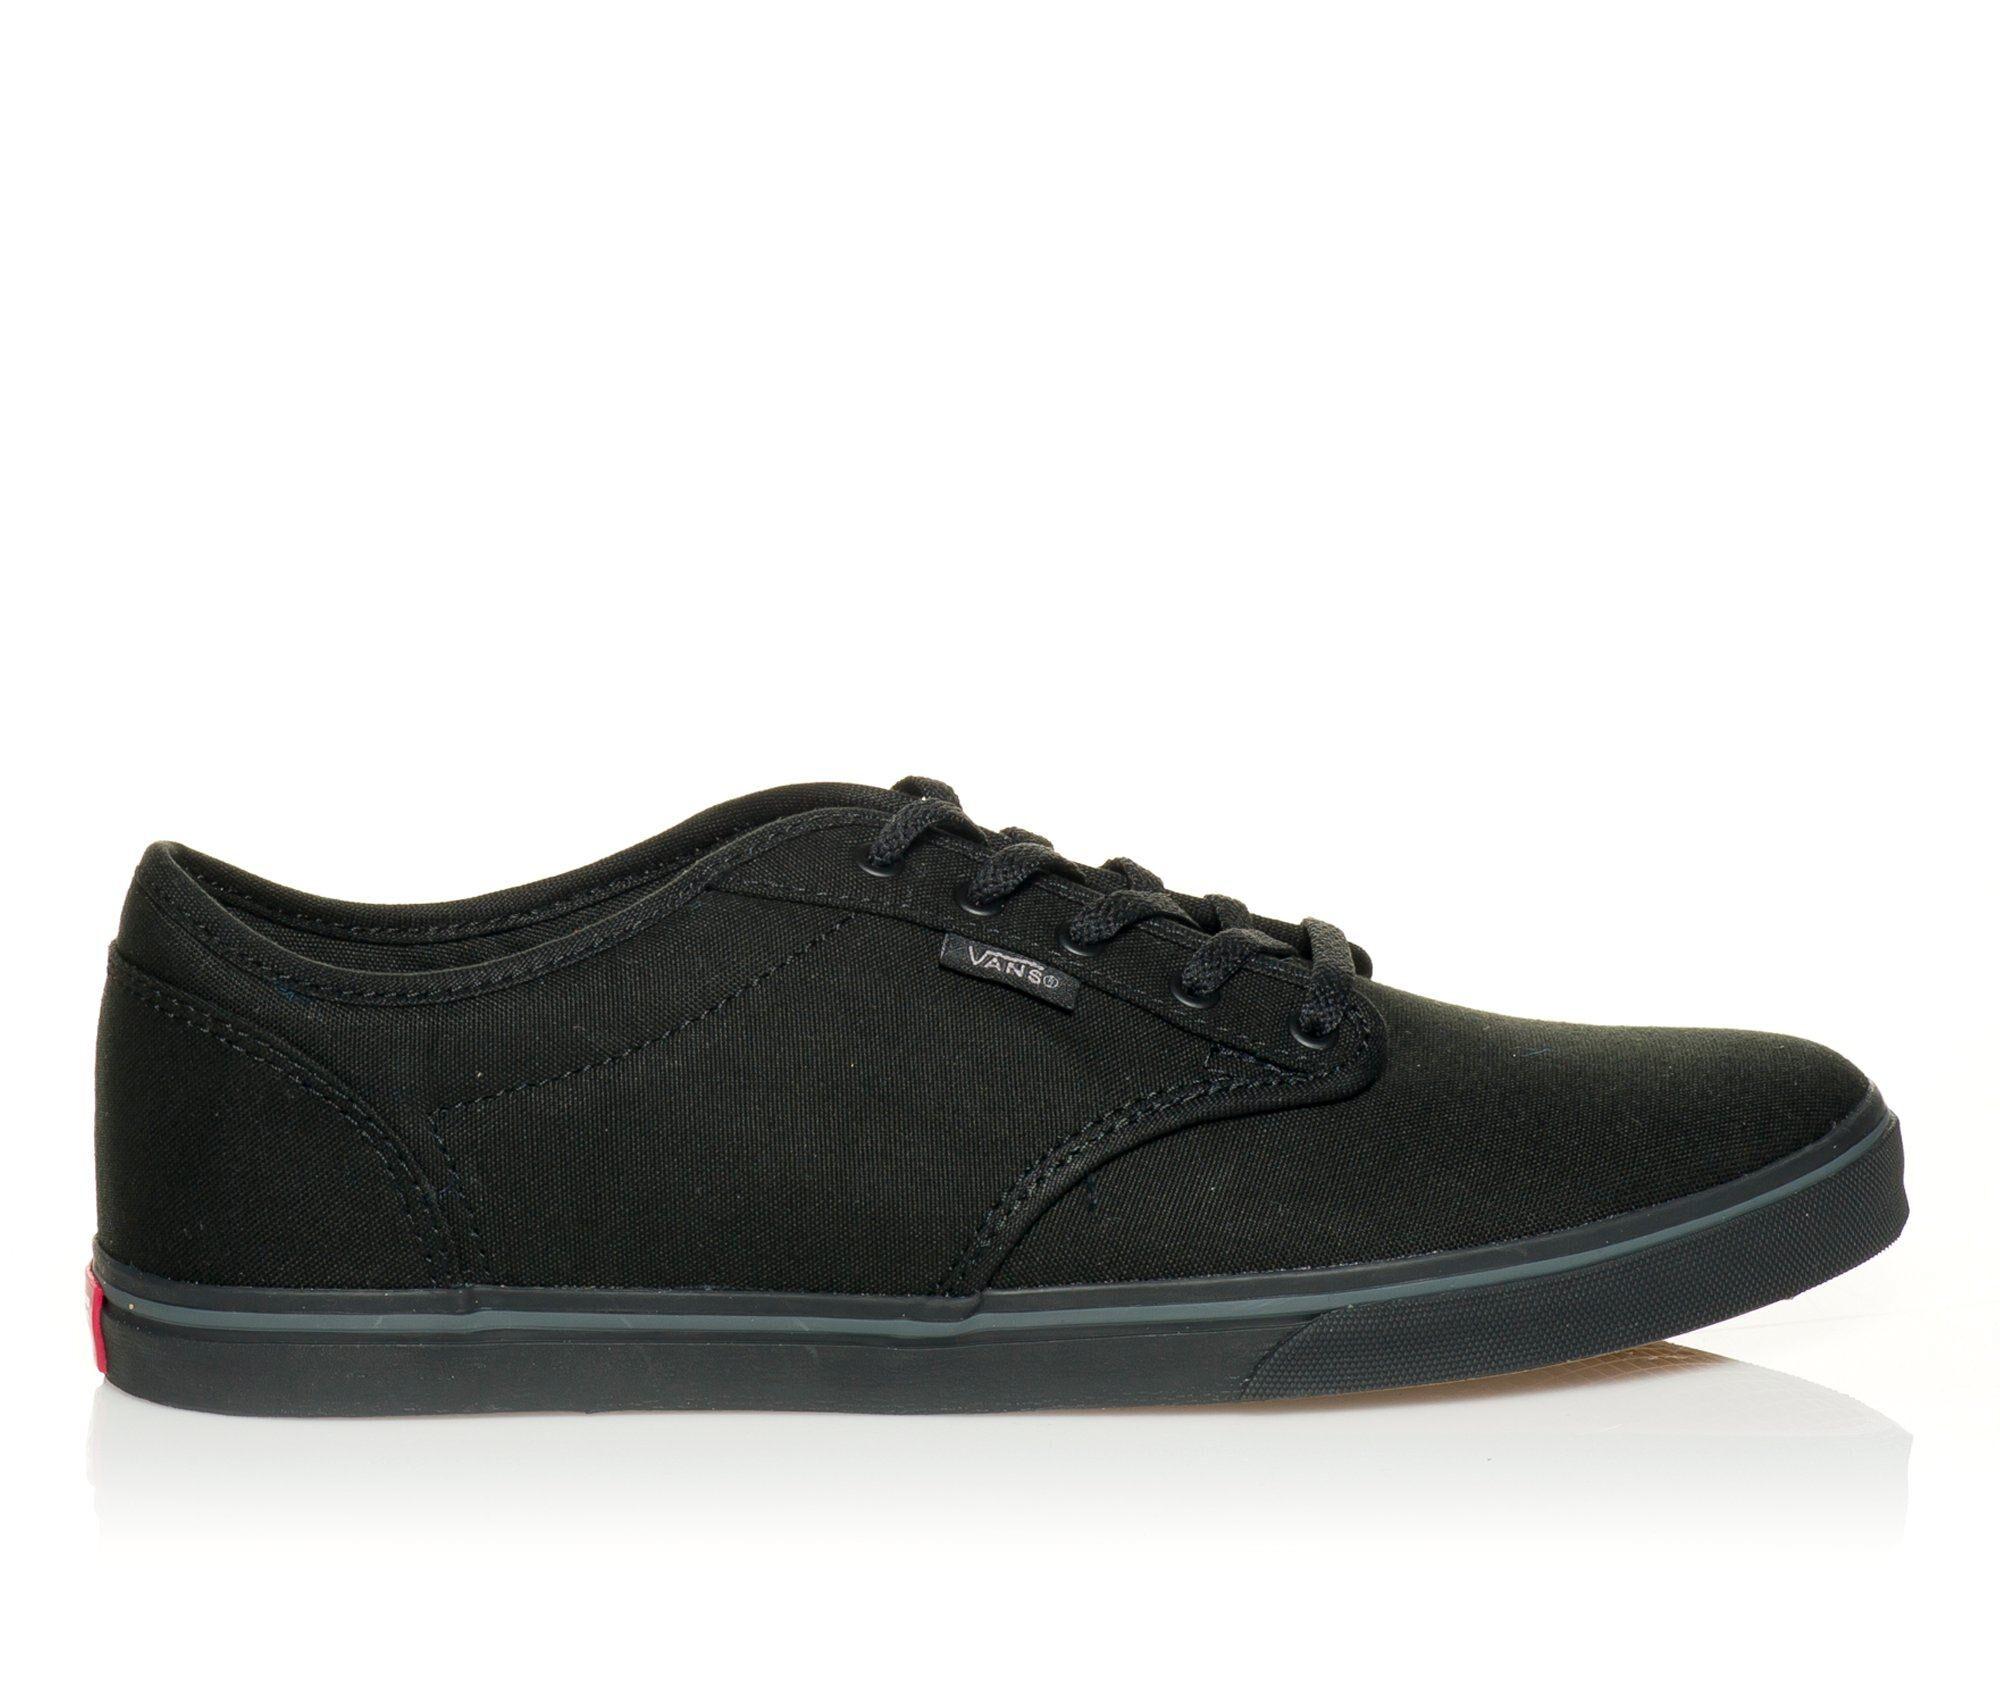 Women's Vans Atwood Low Skate Shoes Black Mono